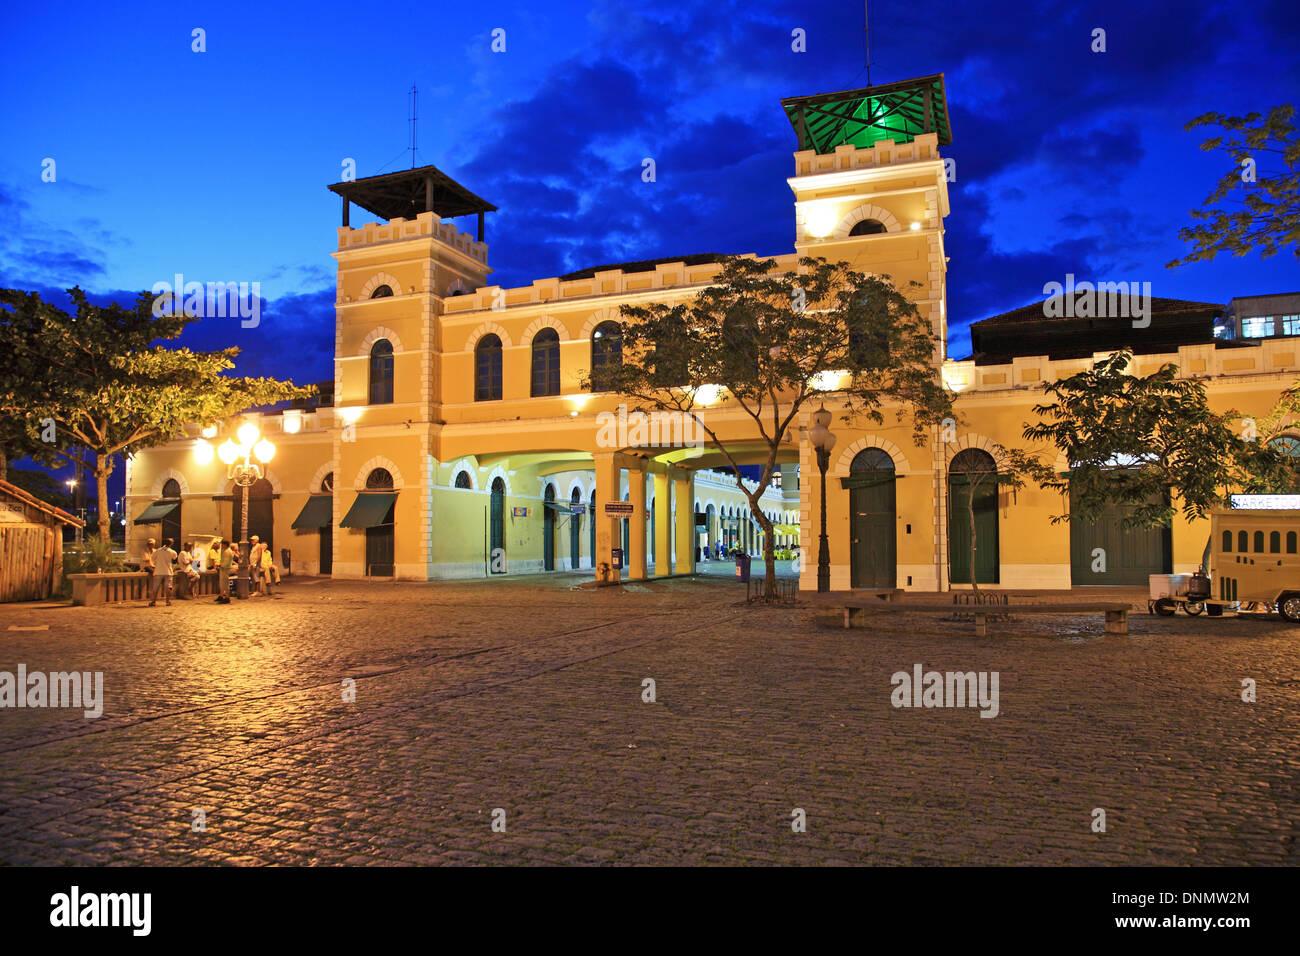 Brazil, Santa catarina, Florianopolis, Municipal Public Market at night - Stock Image